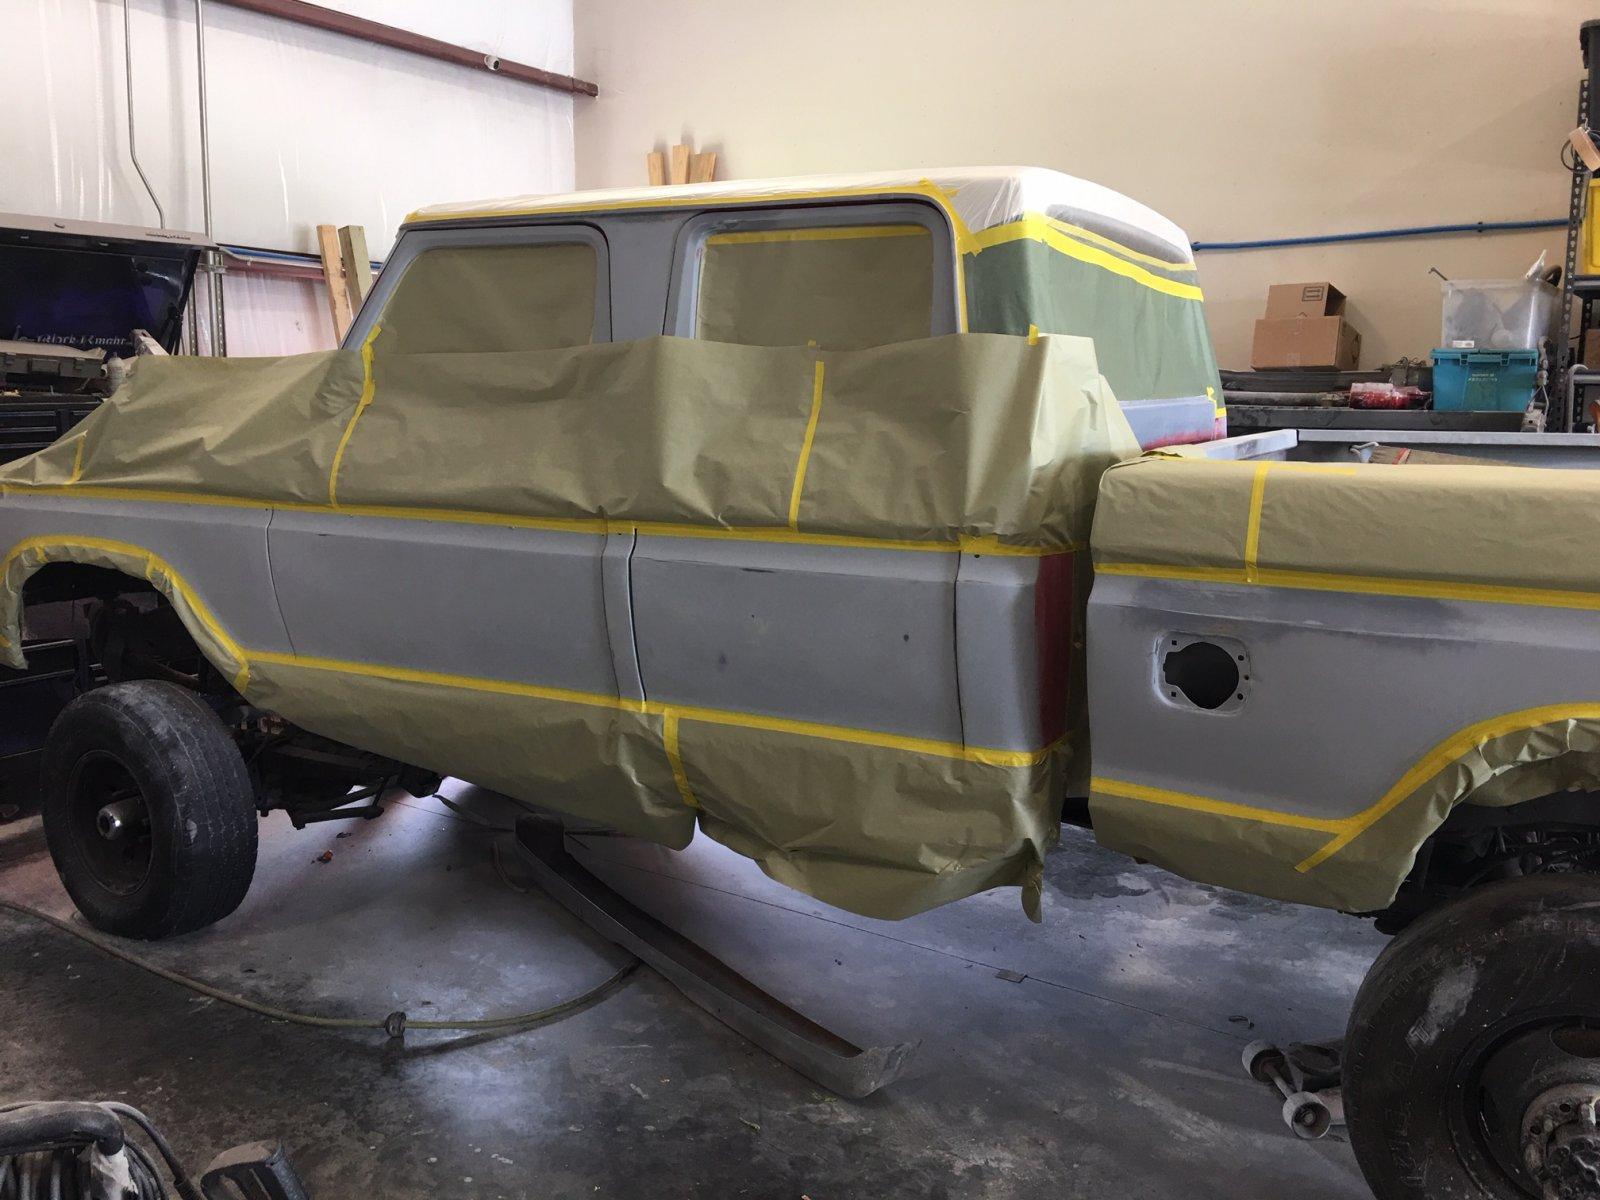 17 Year Old Built His Dream Truck F250 Crew Cab 7.3L Diesel 5.jpeg